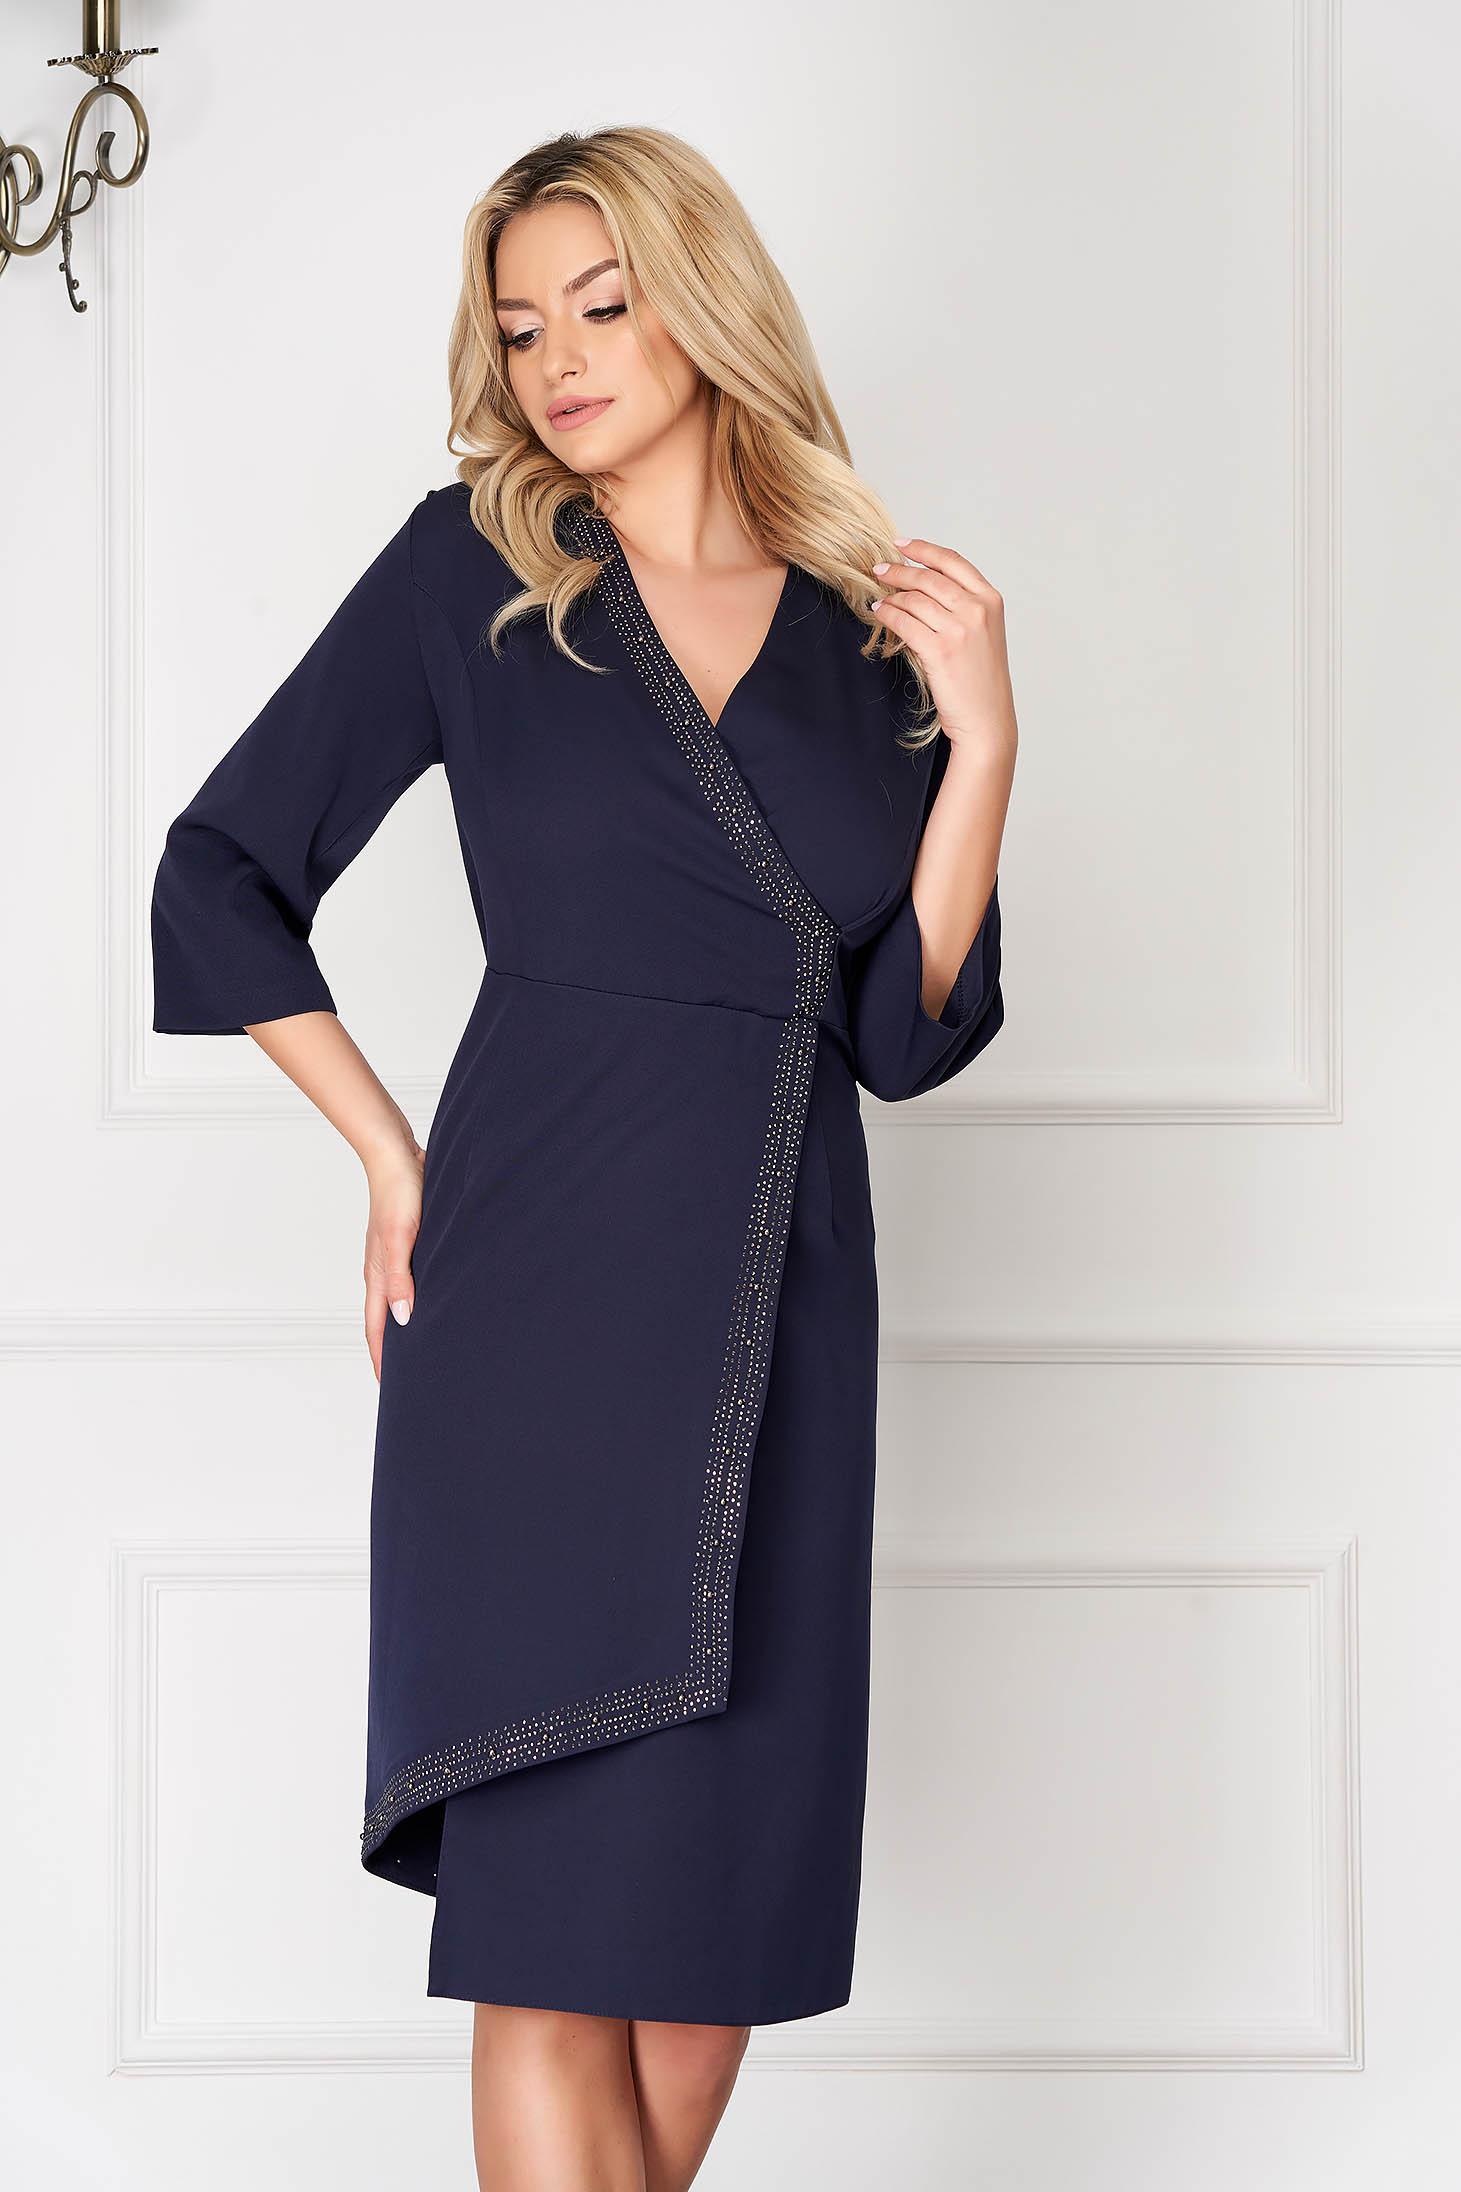 Blue elegant asymmetrical midi pencil dress with 3/4 sleeves